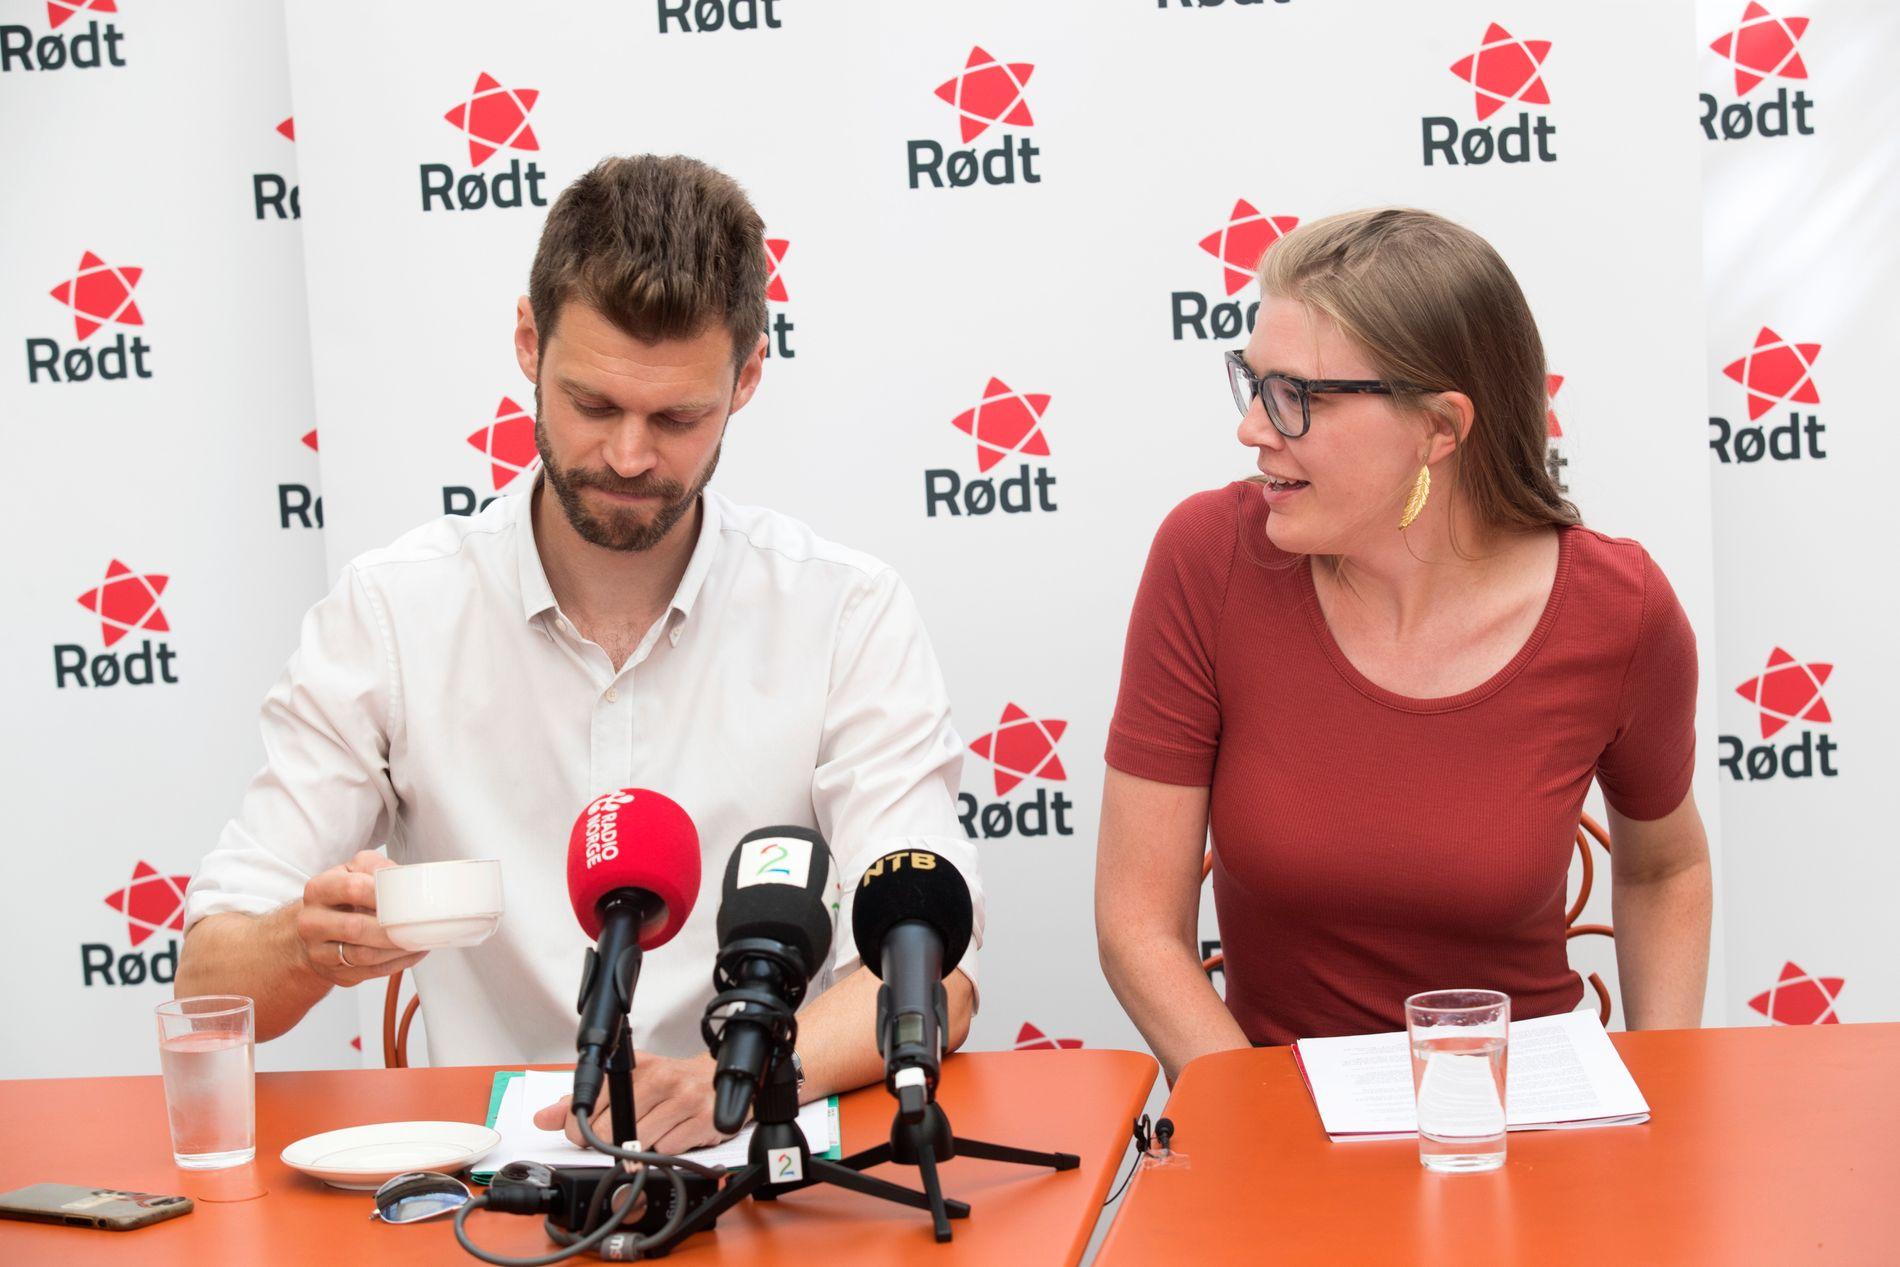 LEDELSEN: Rødt-leder Bjørnar Moxnes og nestleder Marie Sneve Martinussen på Rødt sin sommerpressekonferanse i Oslo torsdag